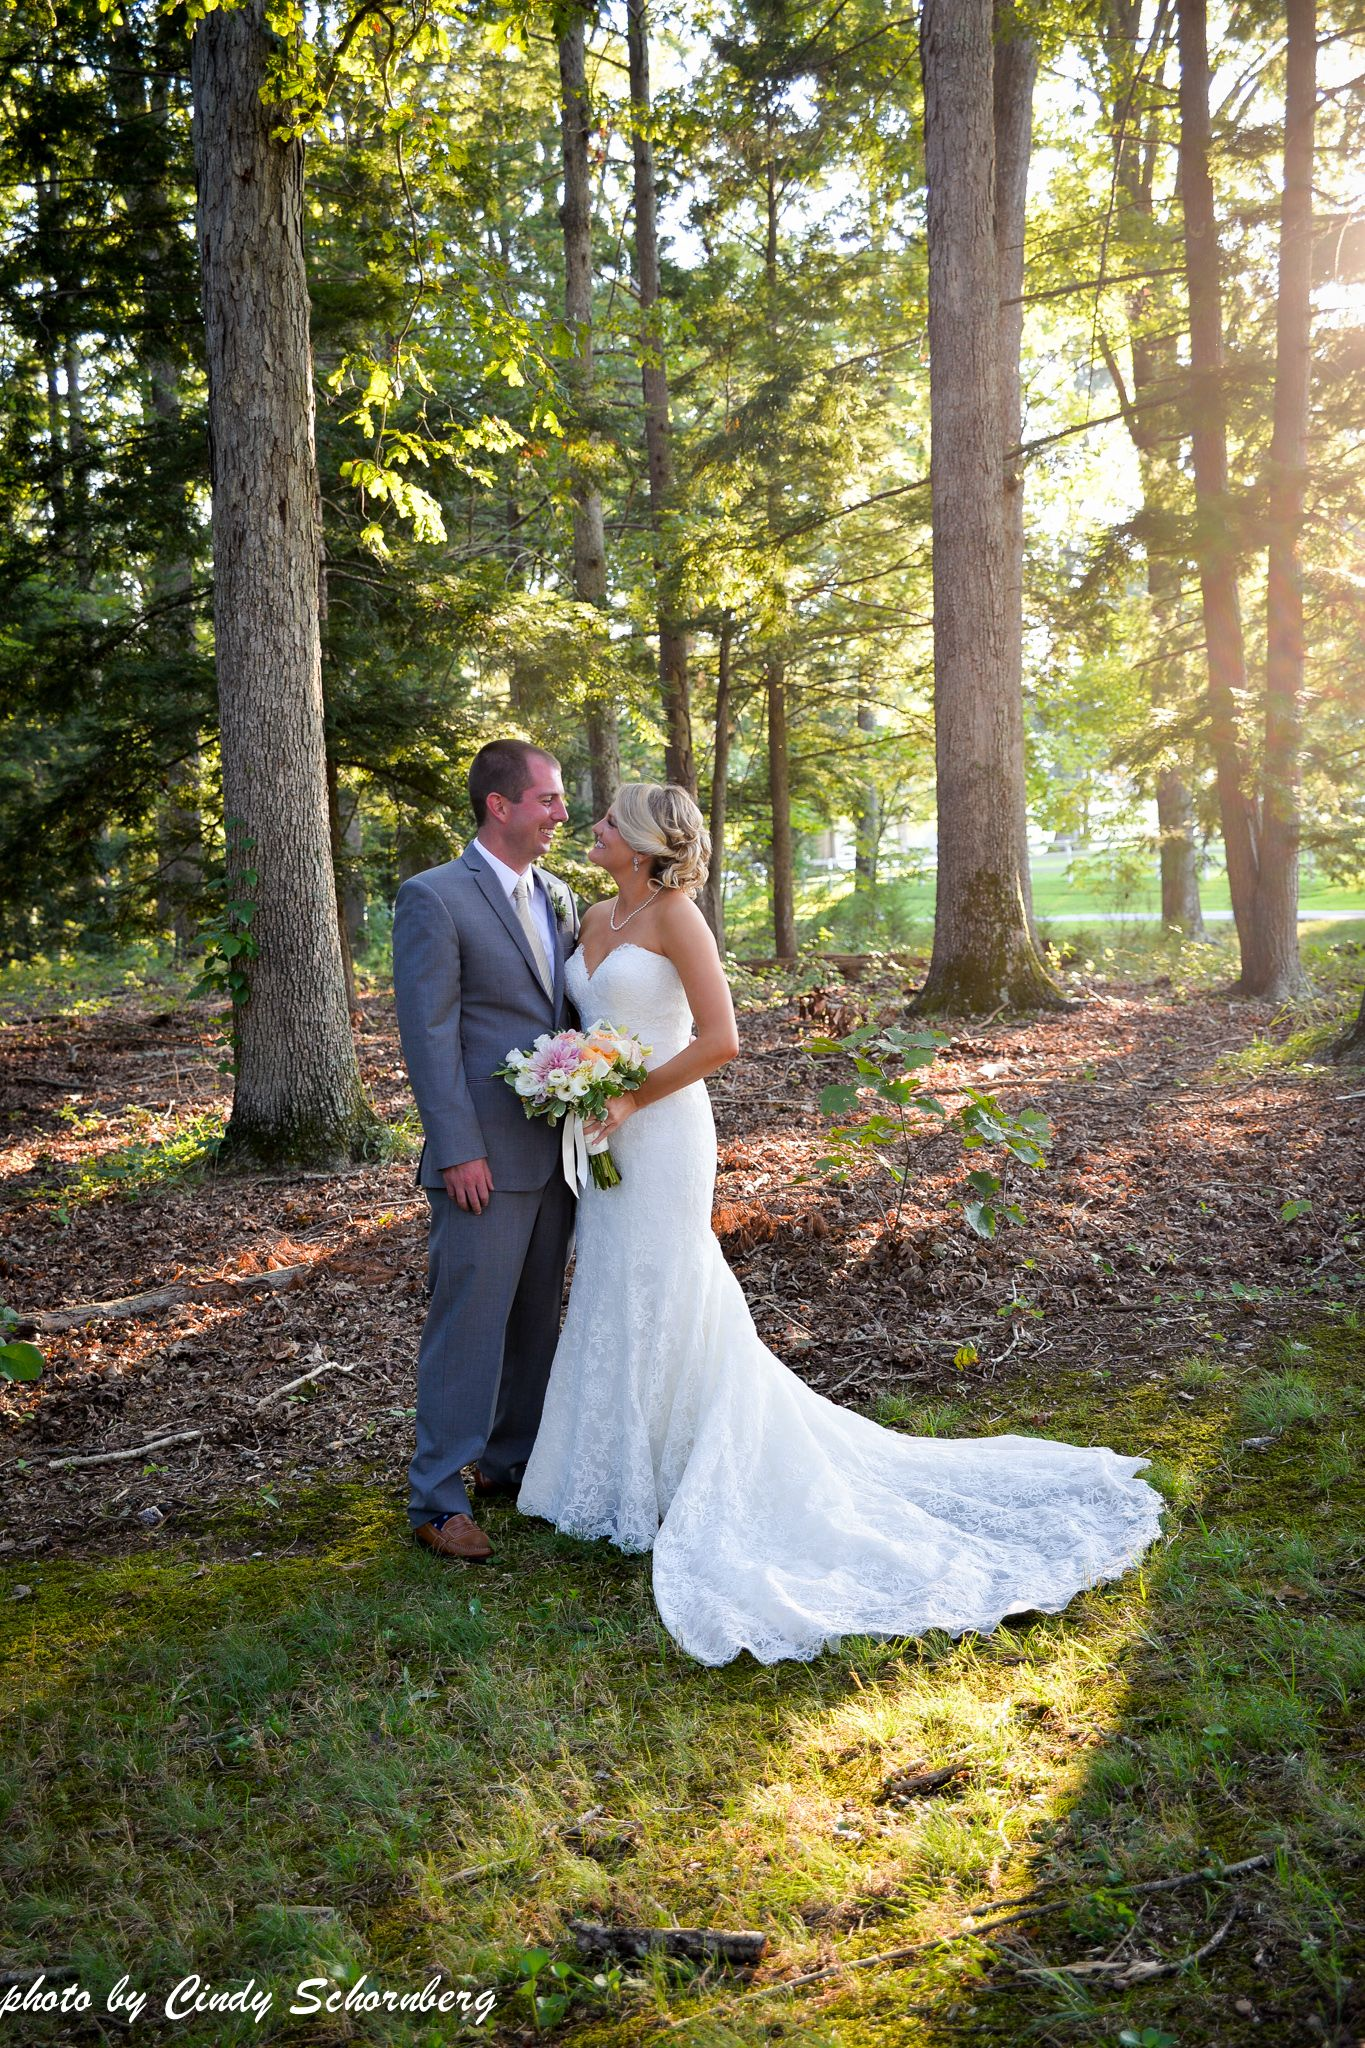 32+ Wedding places in charlottesville va ideas in 2021